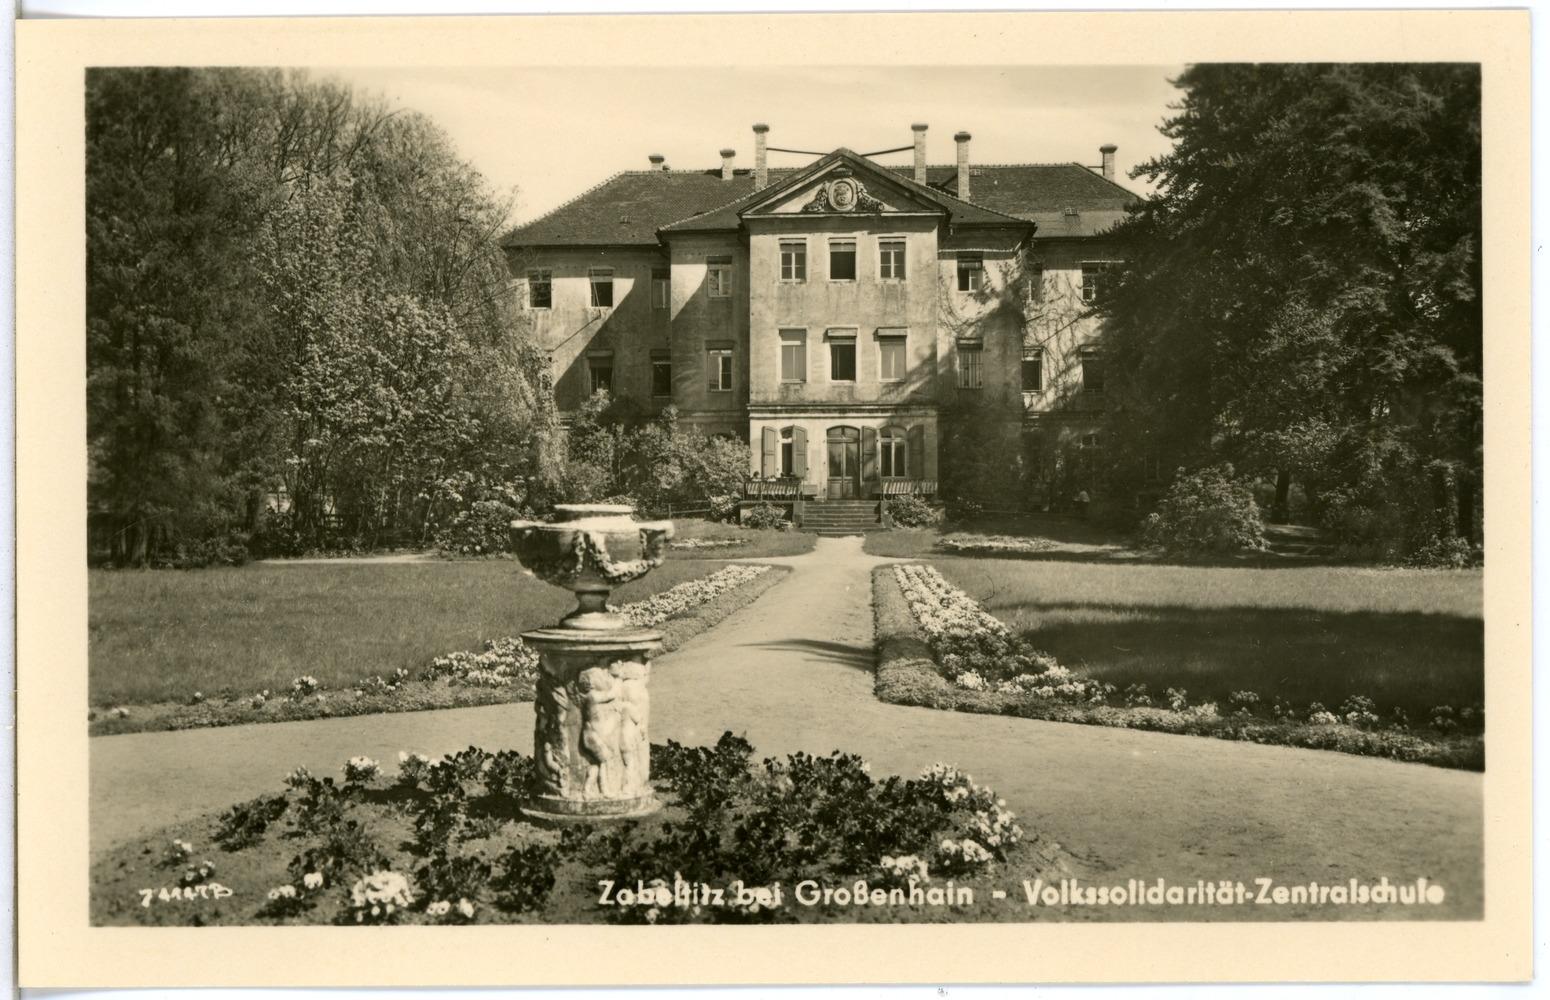 File:28827-Zabeltitz-1955-Volkssolidarität - Zentralschule-Brück & Sohn  Kunstverlag